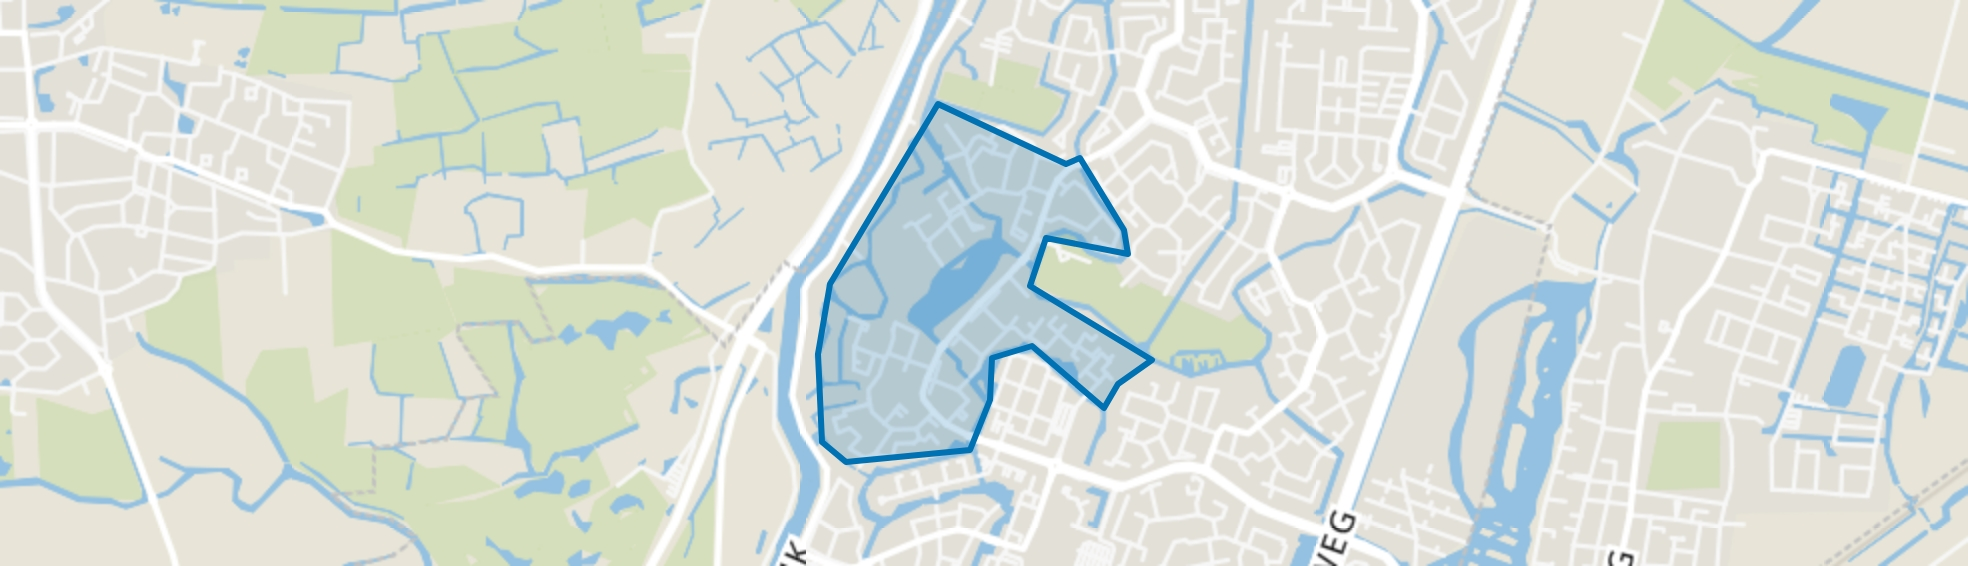 't Rak-Noord, Alkmaar map